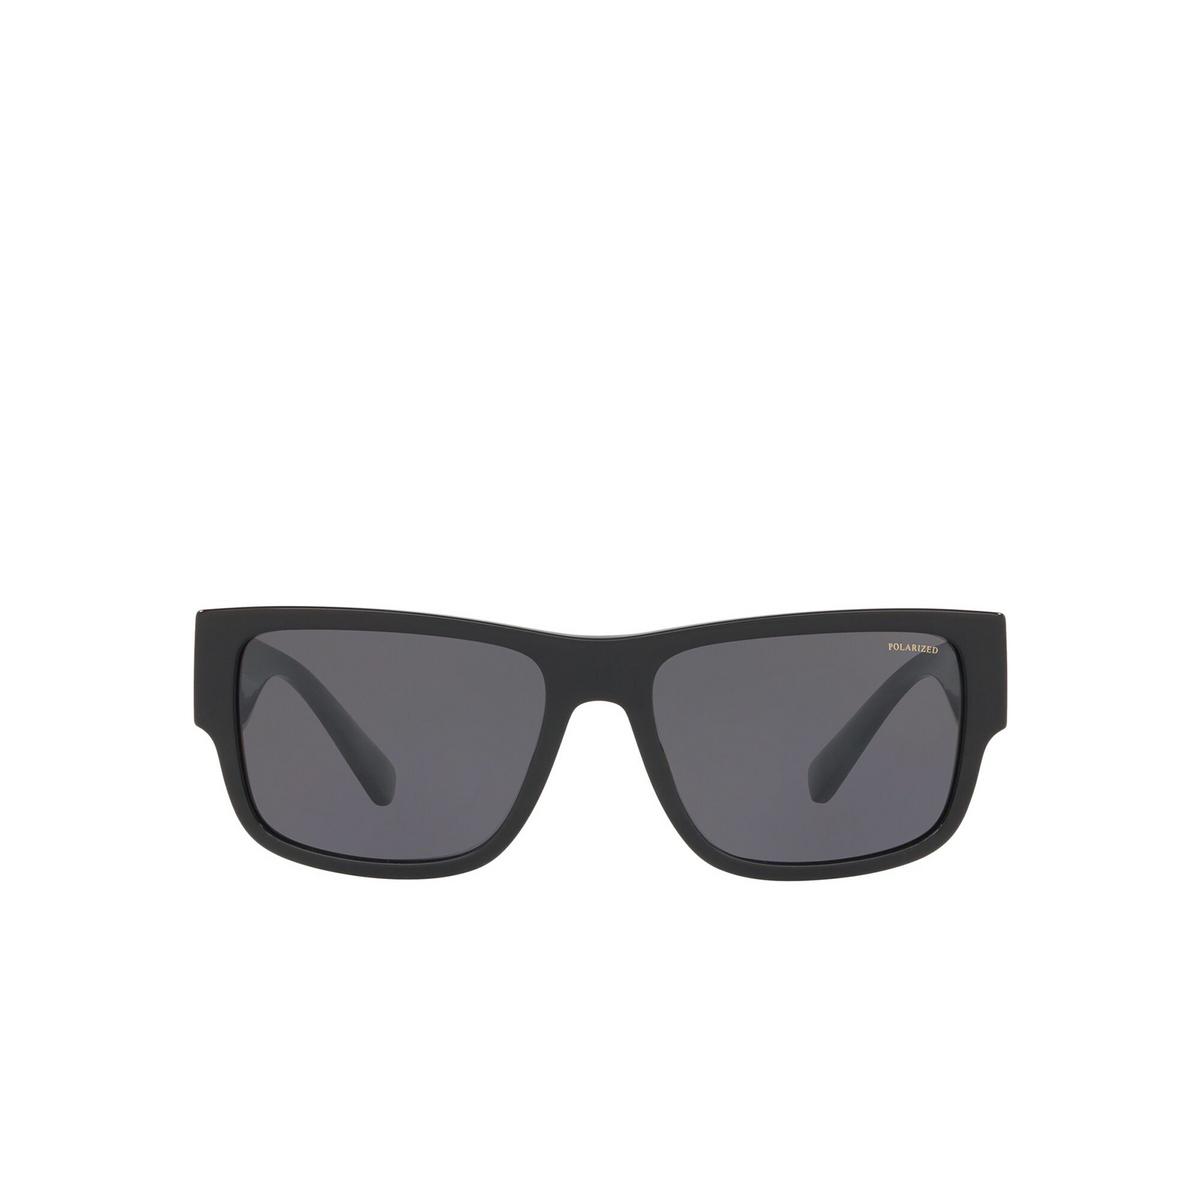 Versace® Square Sunglasses: VE4369 color Black GB1/81 - front view.